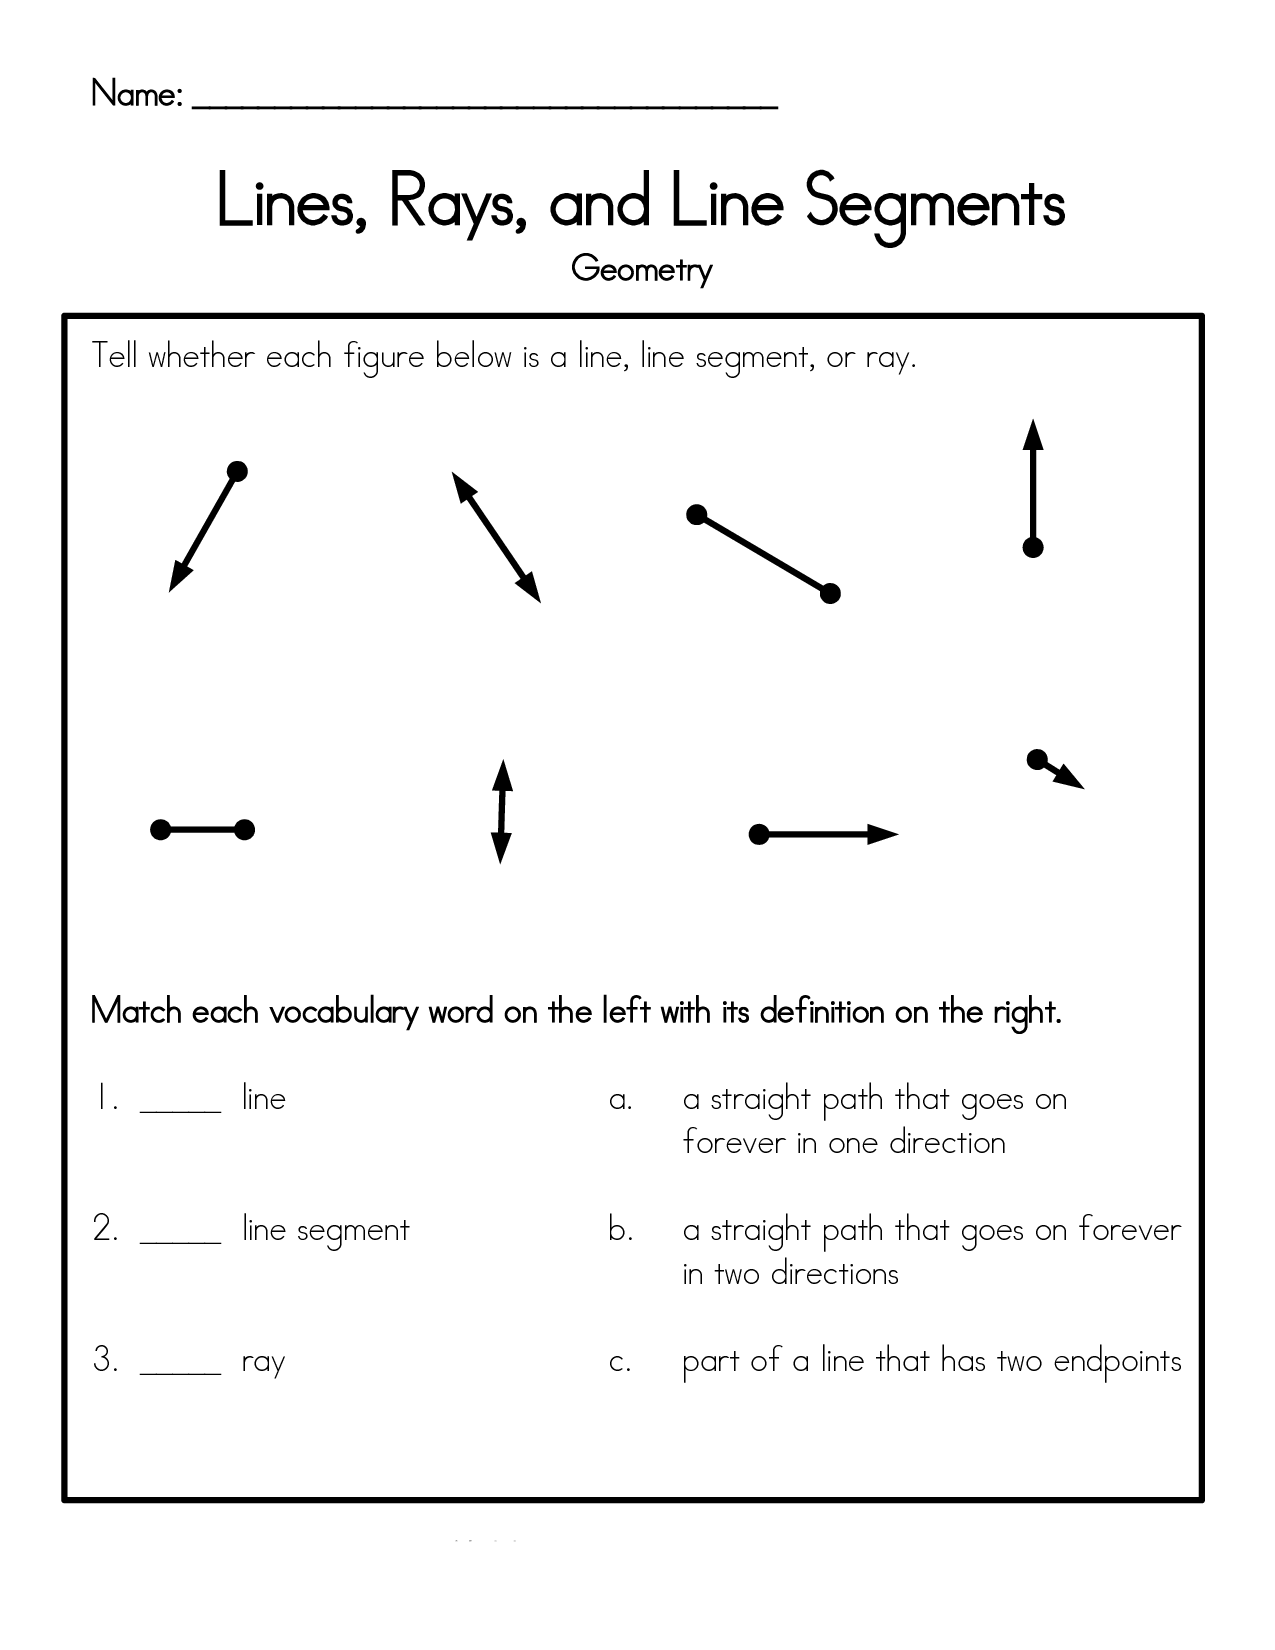 4th Grade Worksheets - Best Coloring Pages For Kids   Segmentation [ 1650 x 1275 Pixel ]